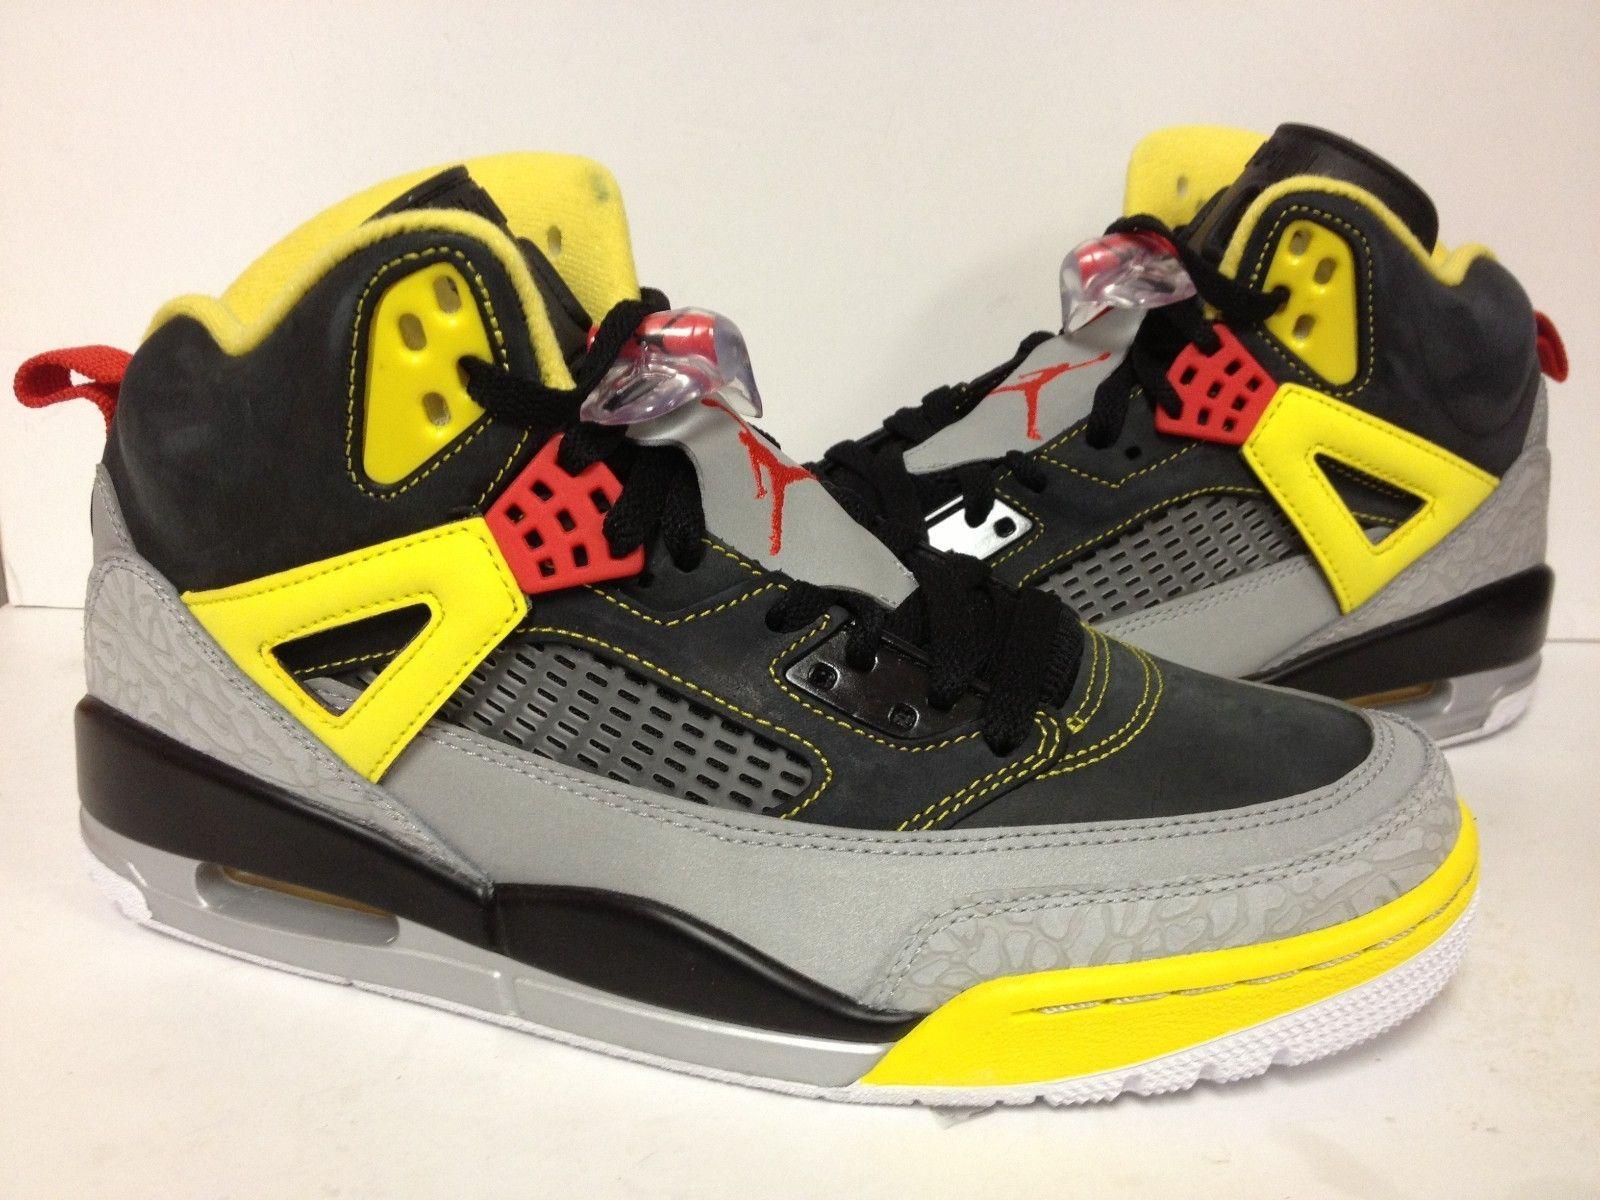 Spike Lee 2013 Jordans